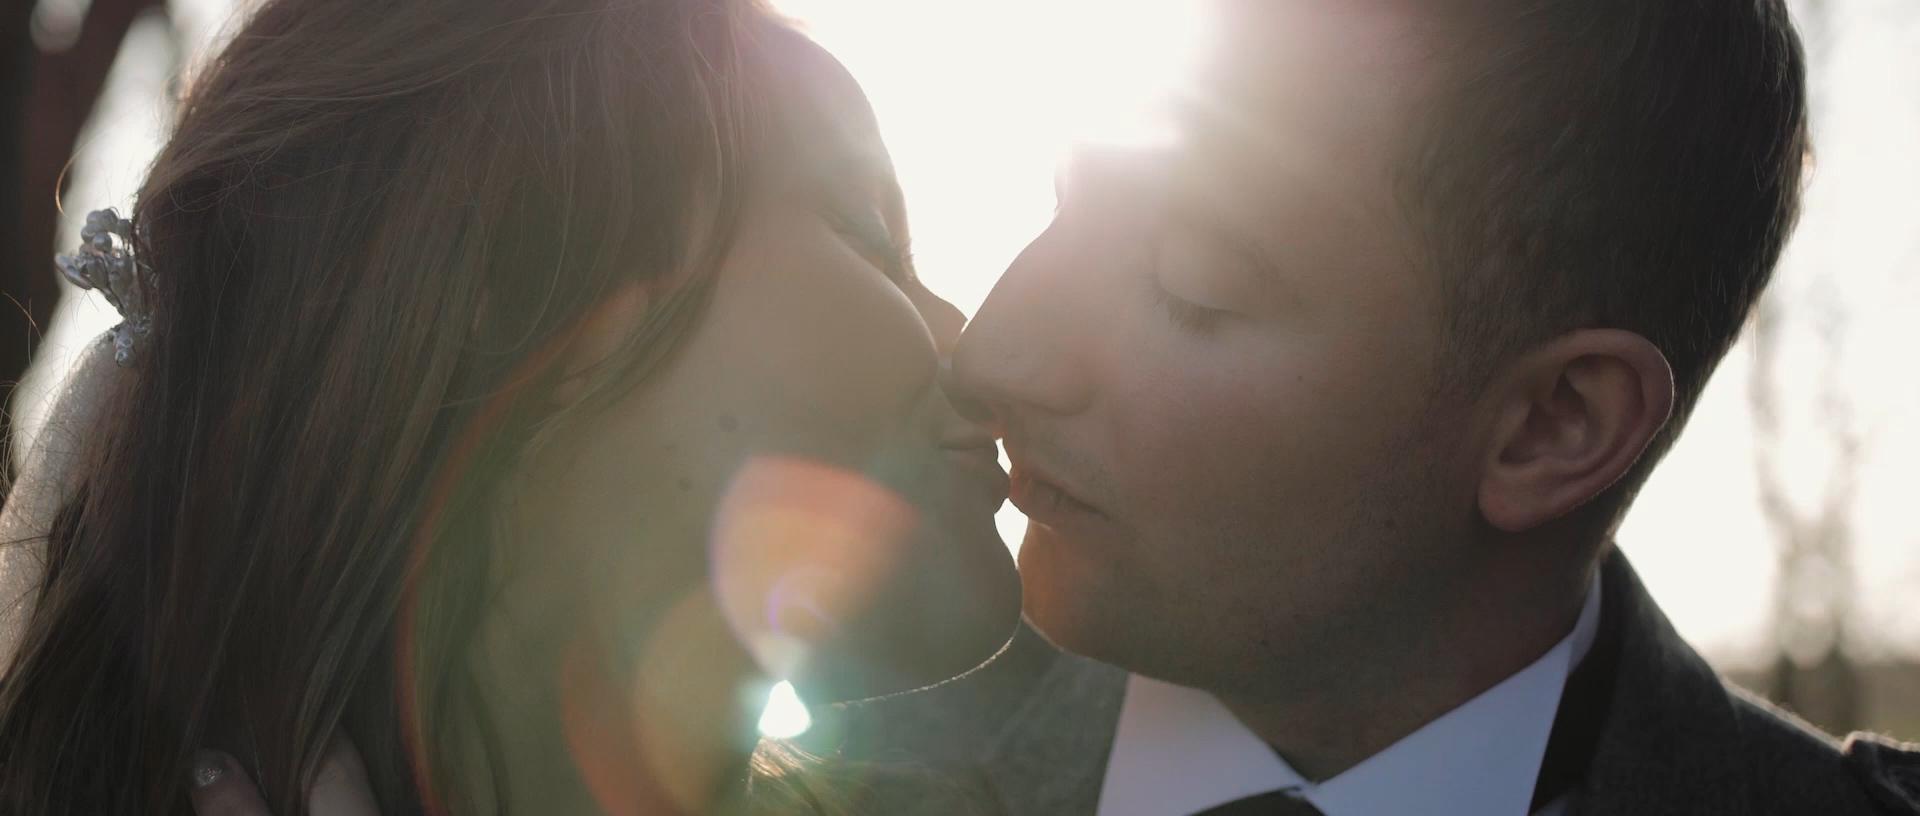 banchory-wedding-videographer_LL_03.jpg